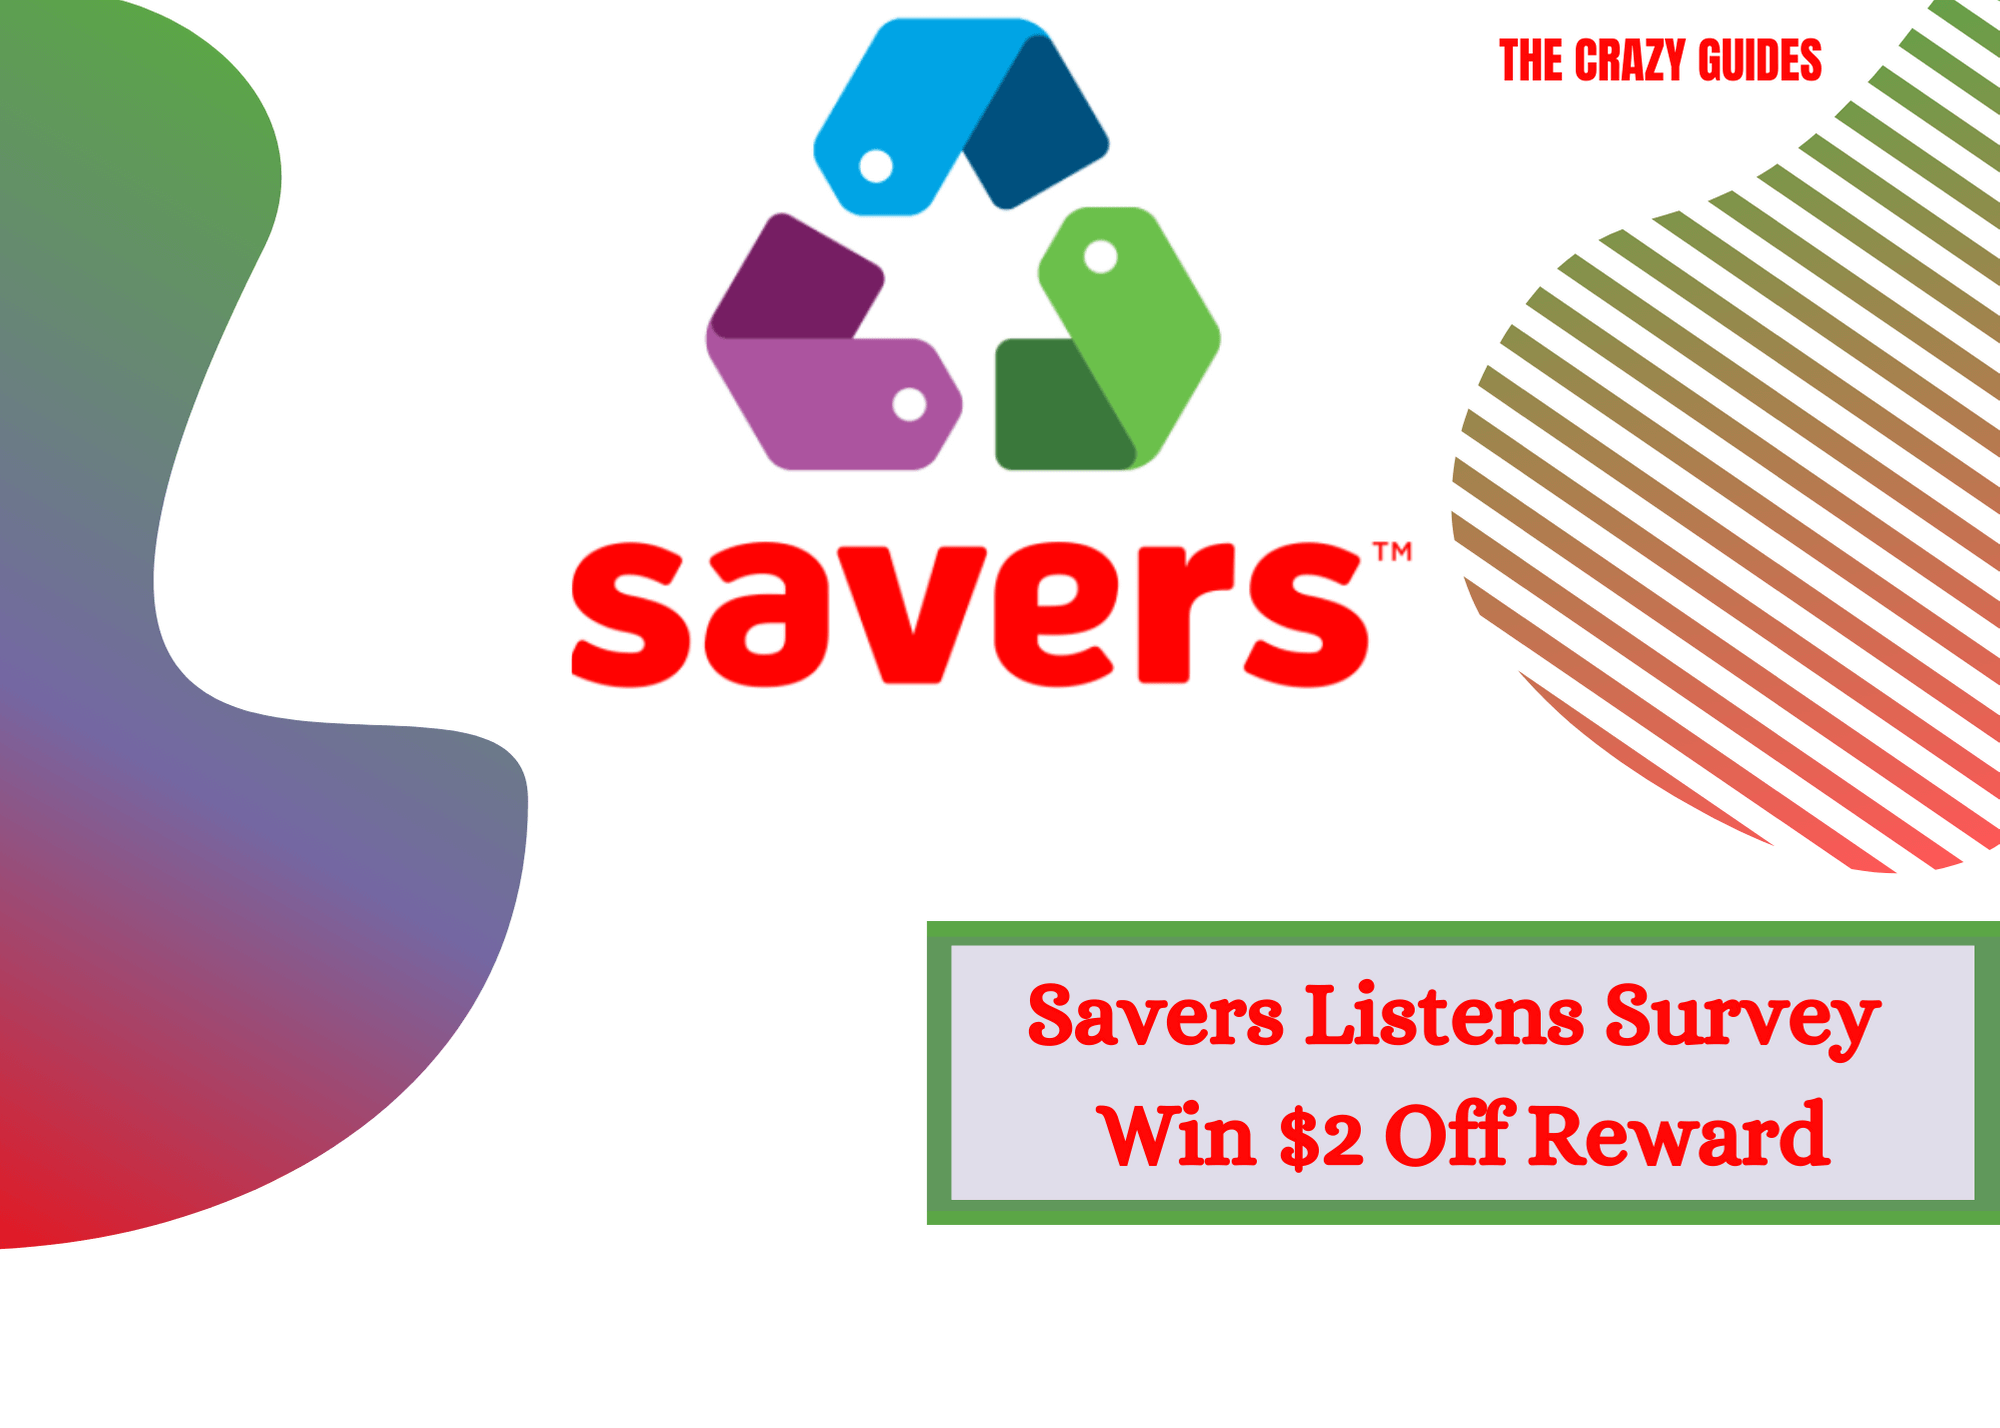 Saverslistens survey